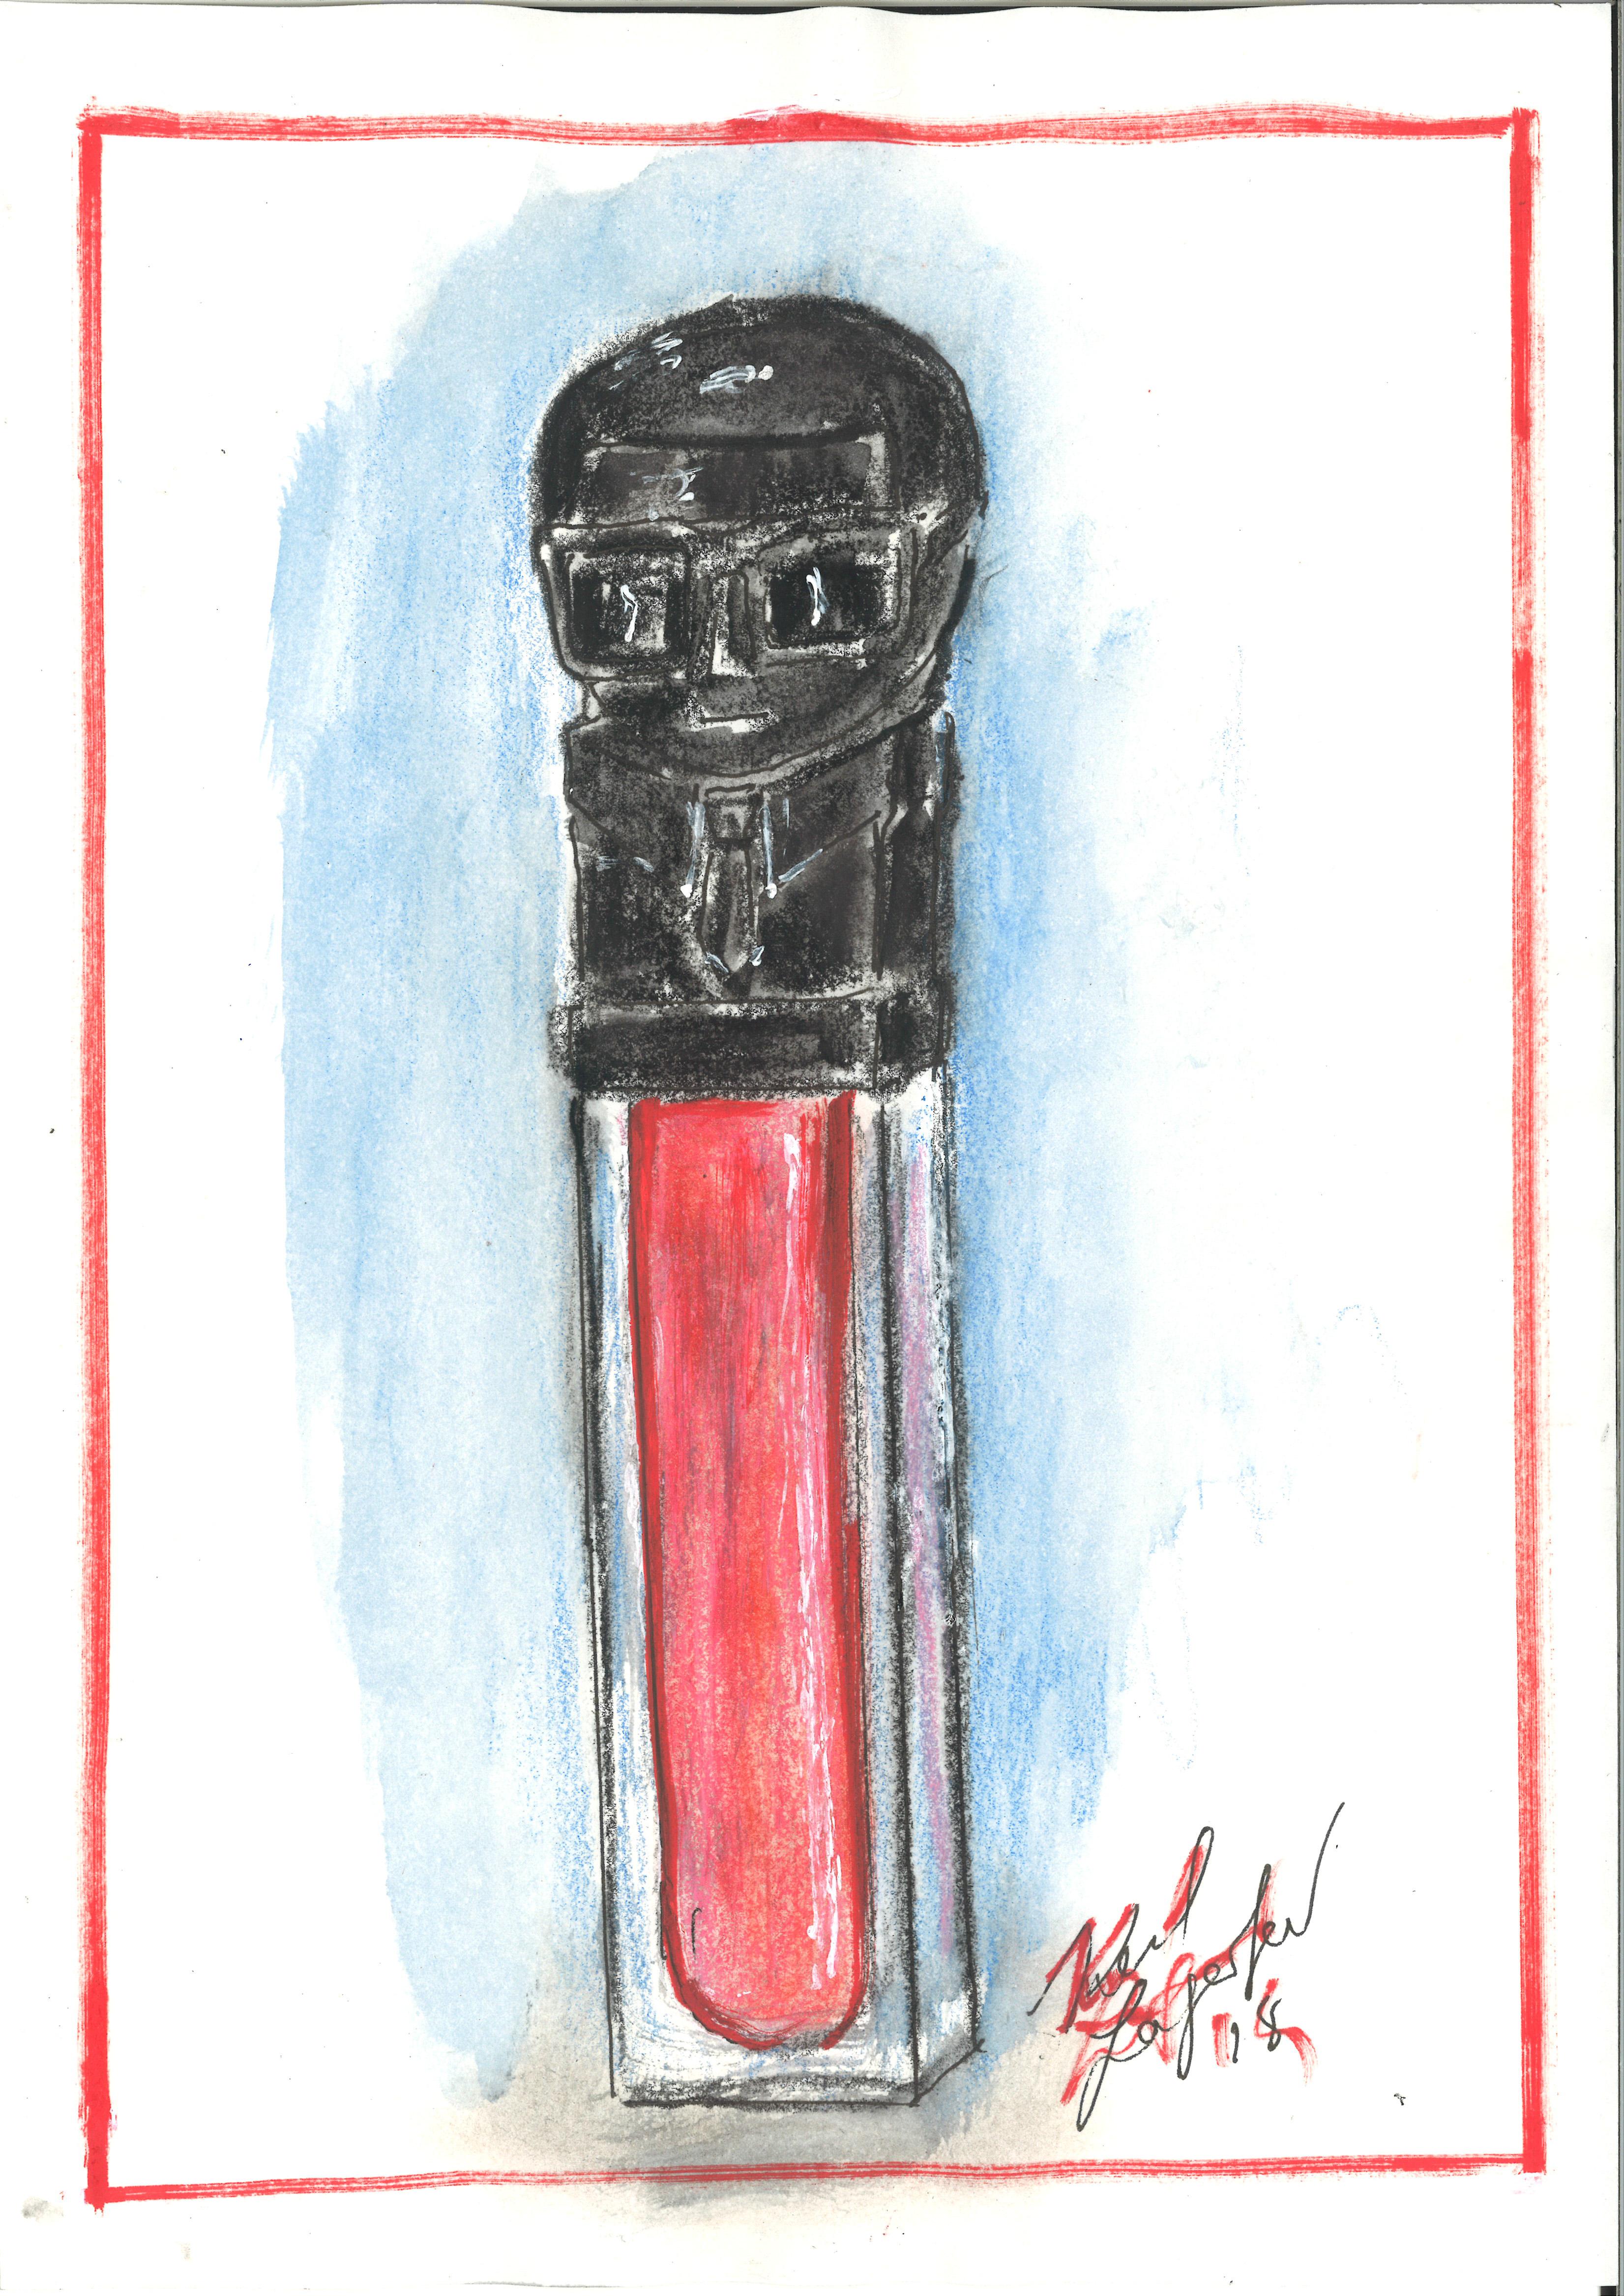 Karl Lagerfeld's sketch